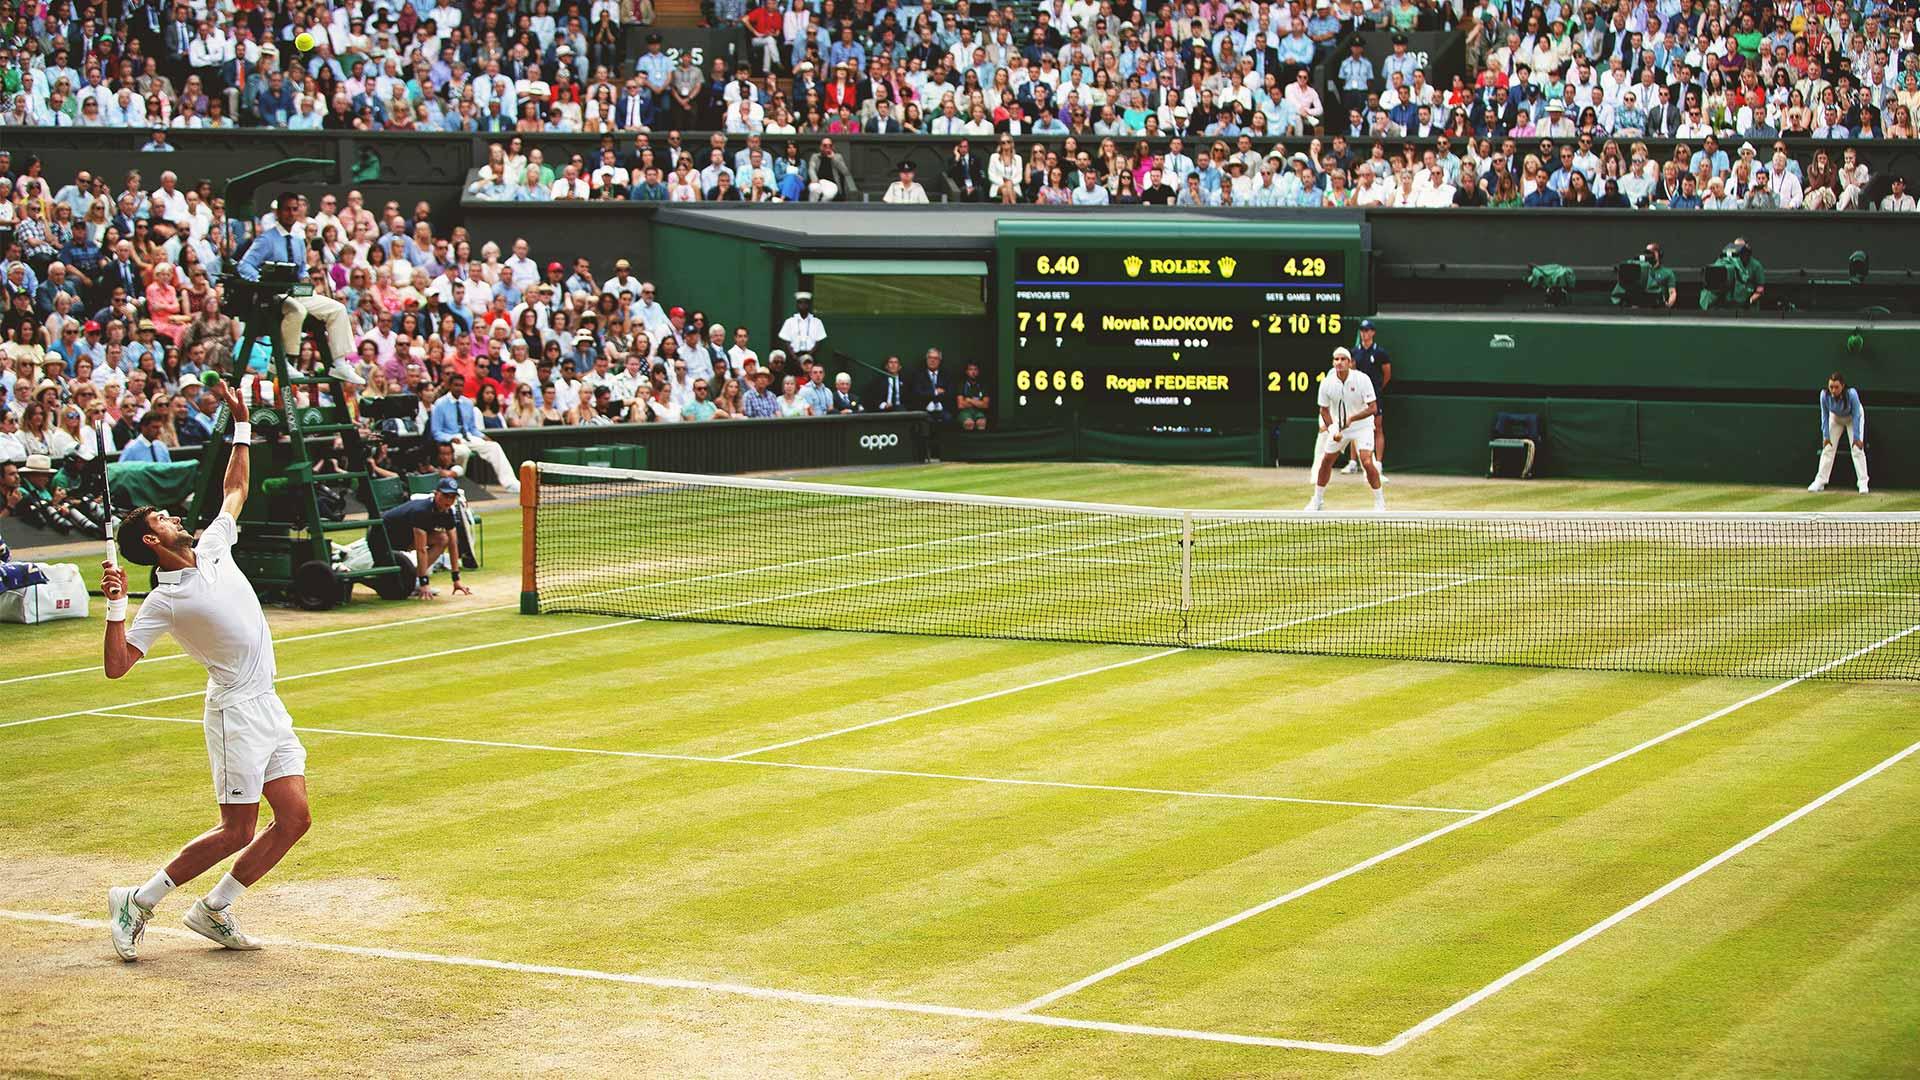 Tournoi Wimbledon tennis incentive seminaire voyage